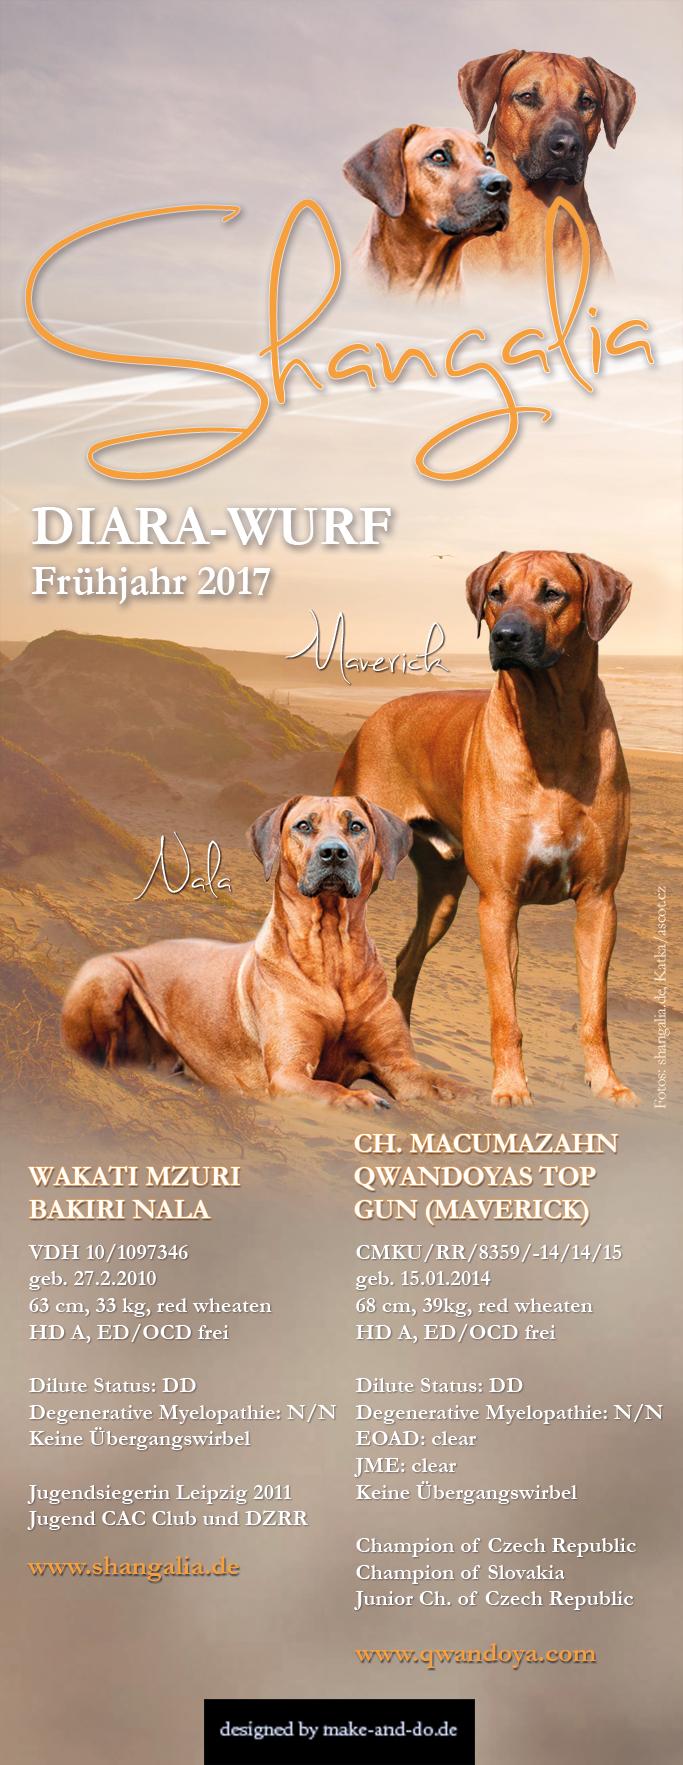 Rhodesian Ridgeback Zucht Züchter Welpen VDH FCI DZRR ELSA RRCD Diara Leipzig shangalia